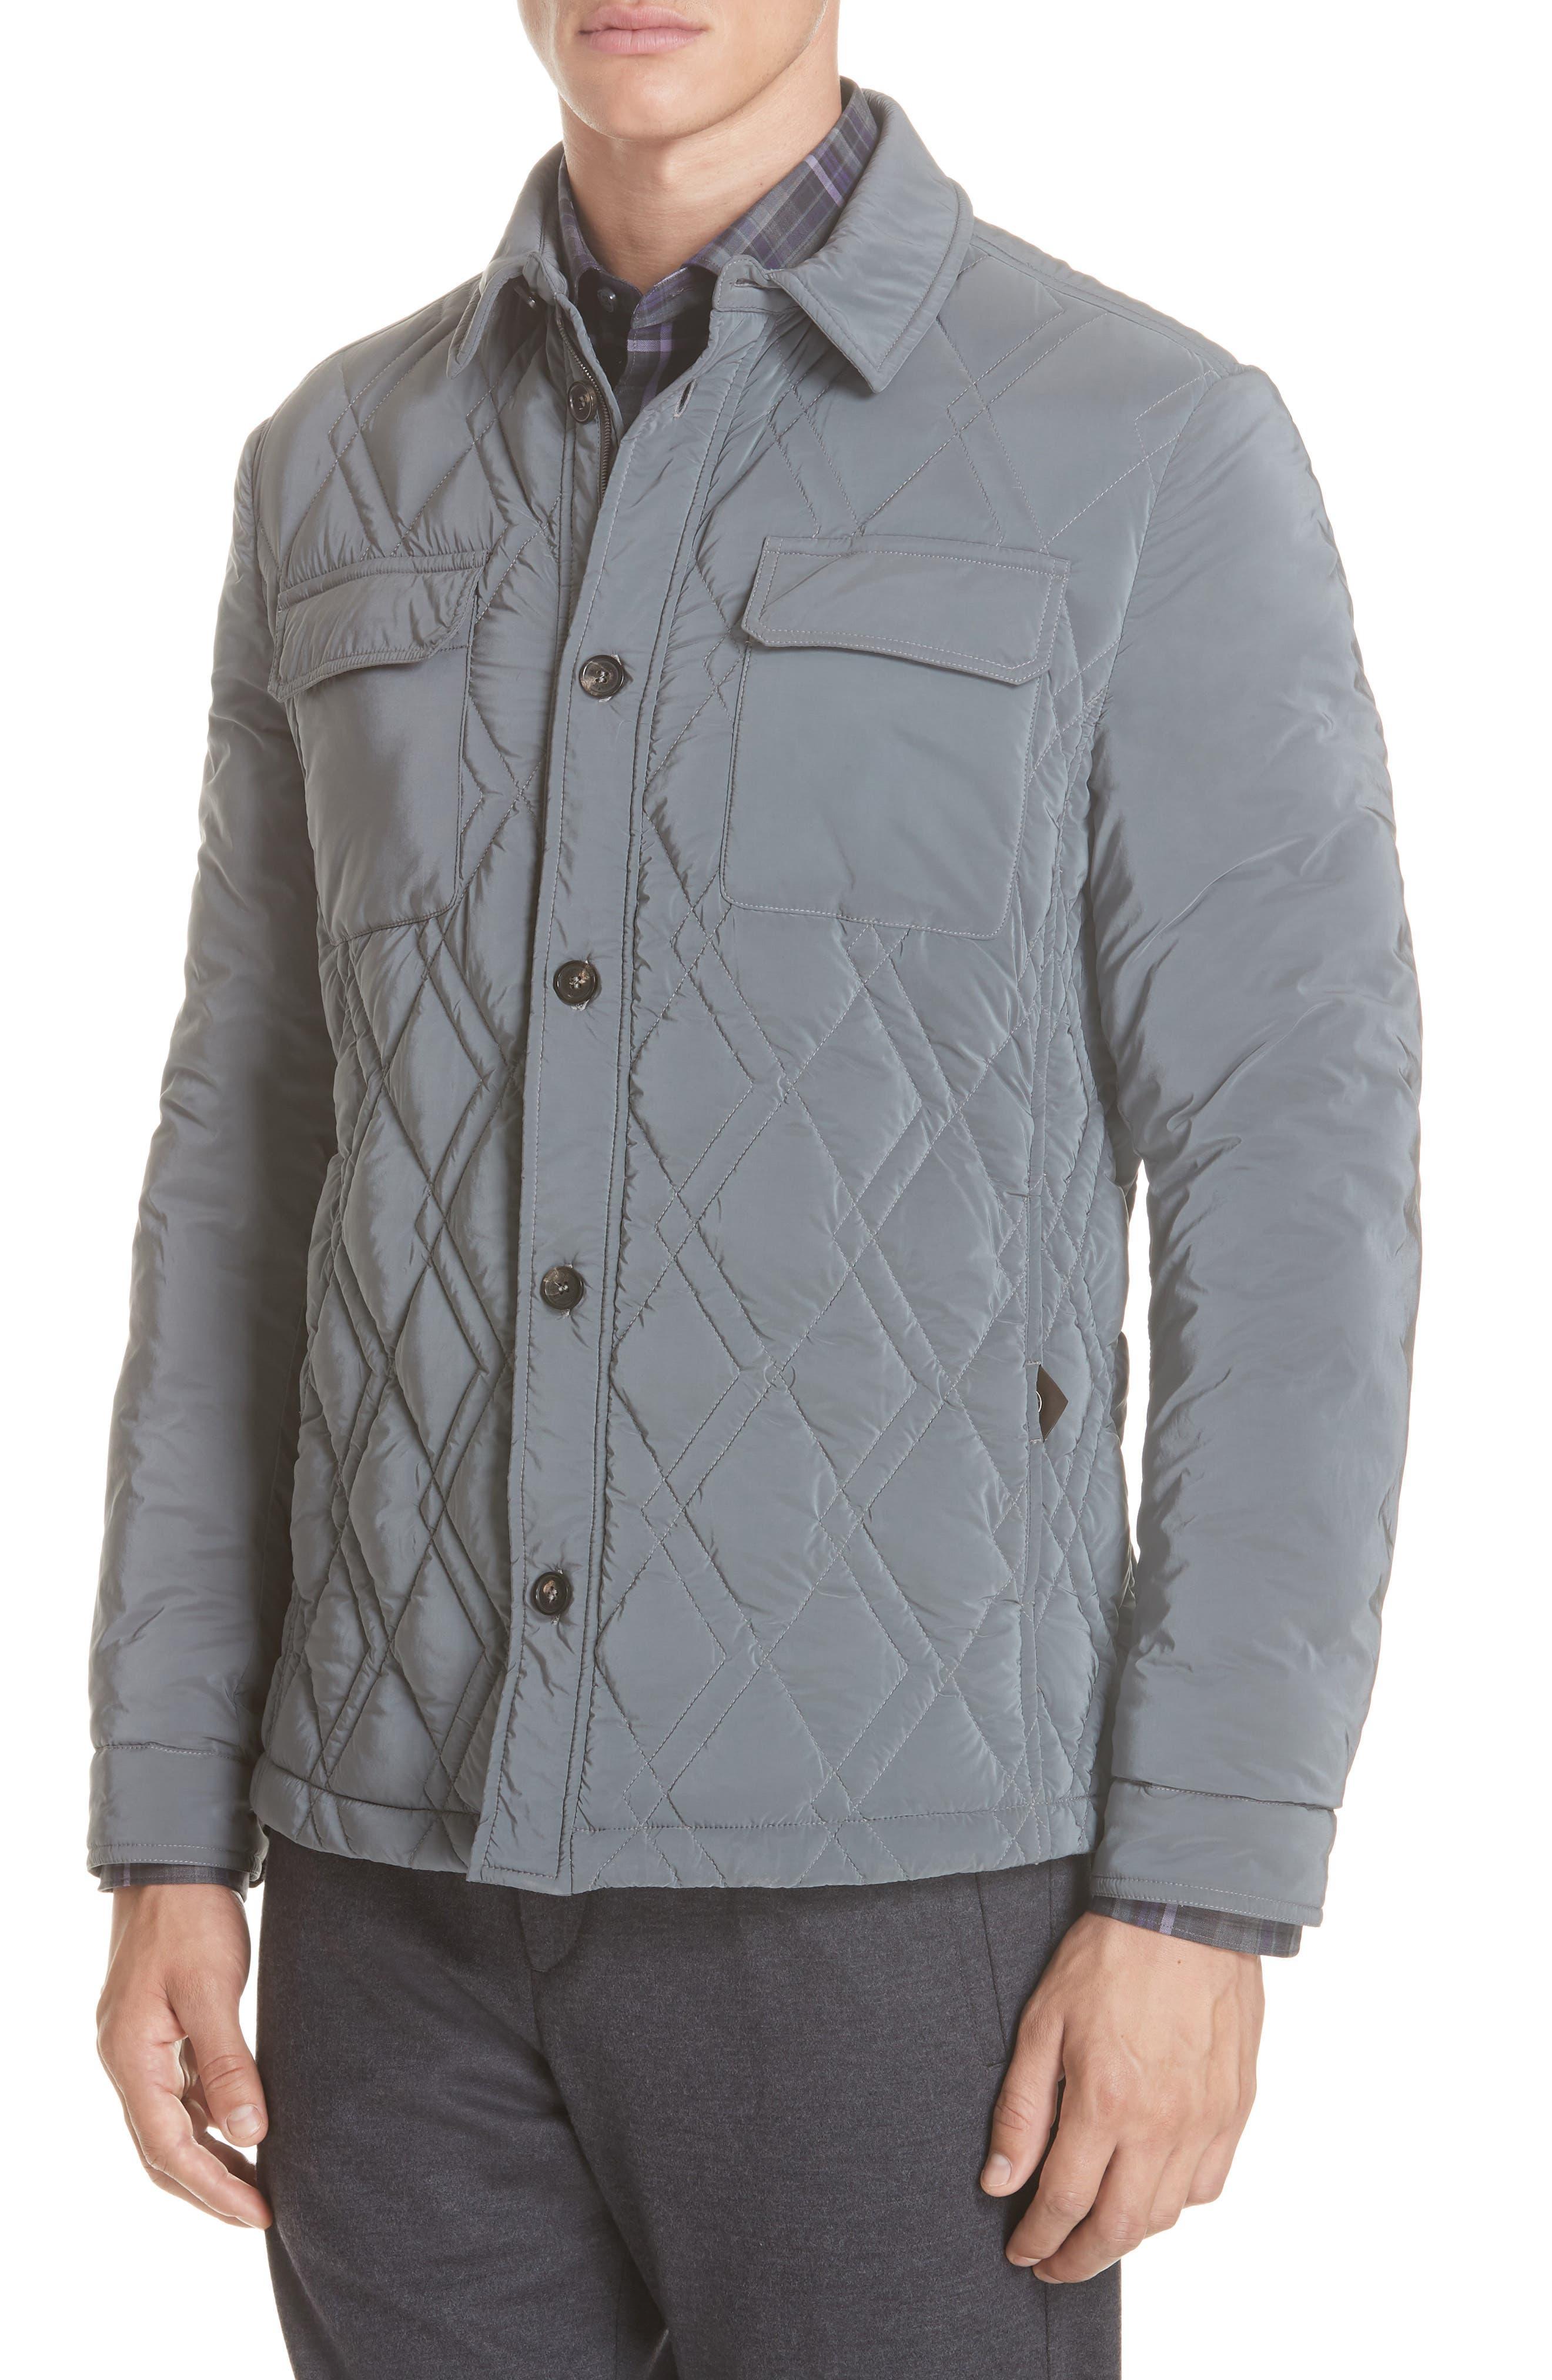 Ermenegildo Zegna Quilted Down Jacket, 0 US / 5R - Grey